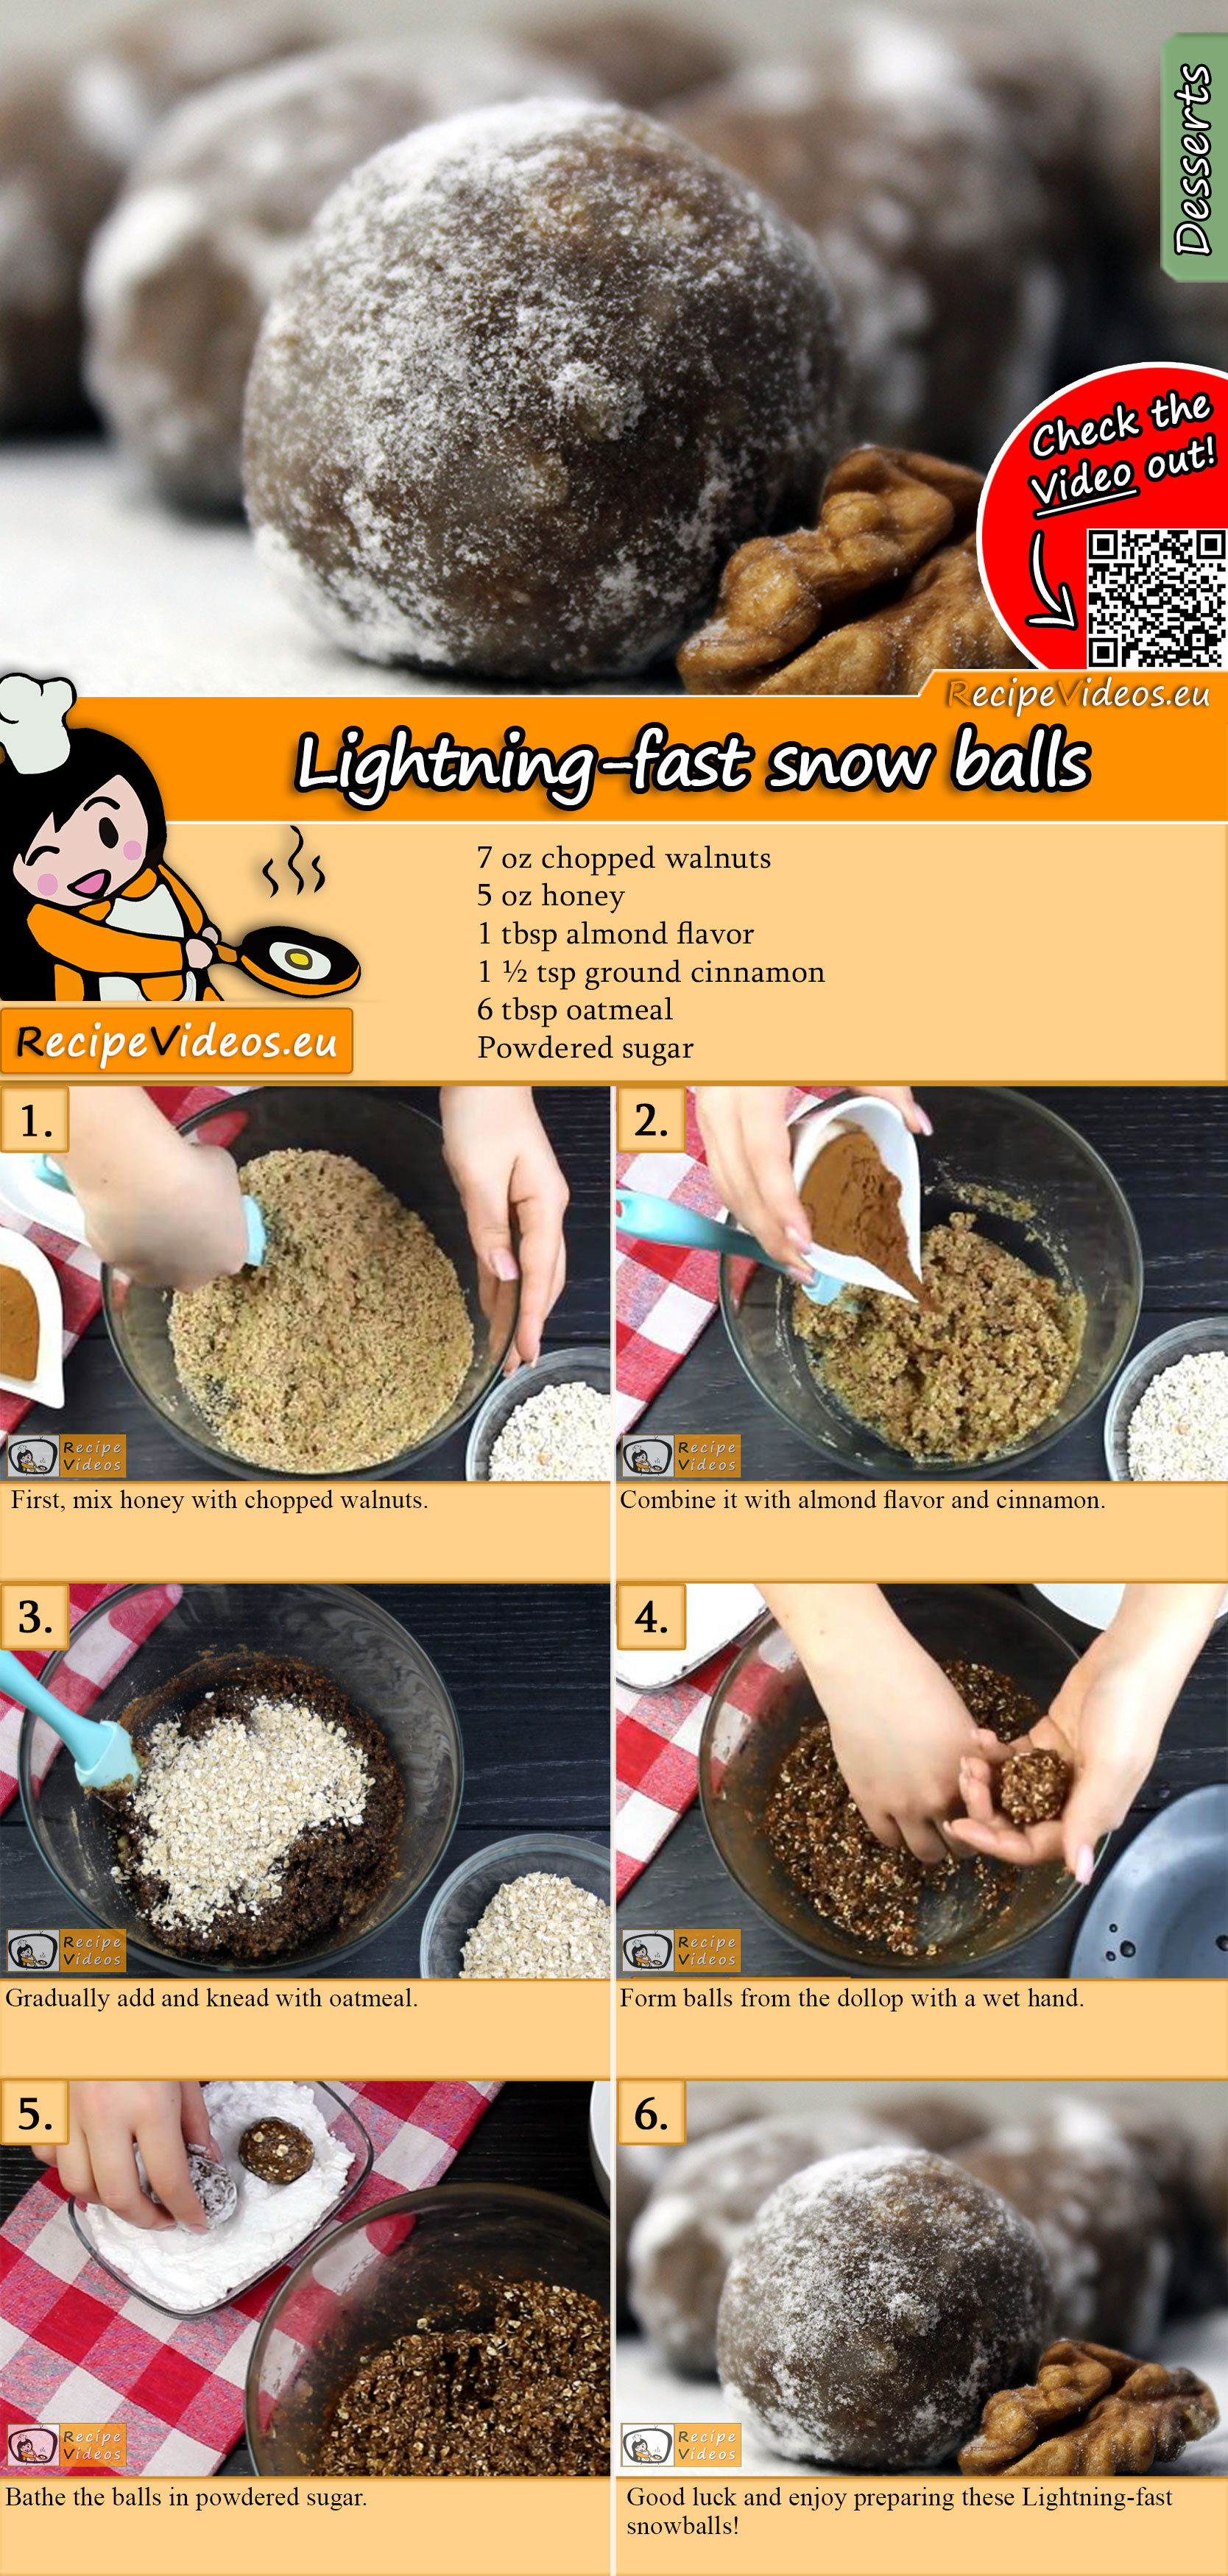 Lightning-fast snow balls recipe with video